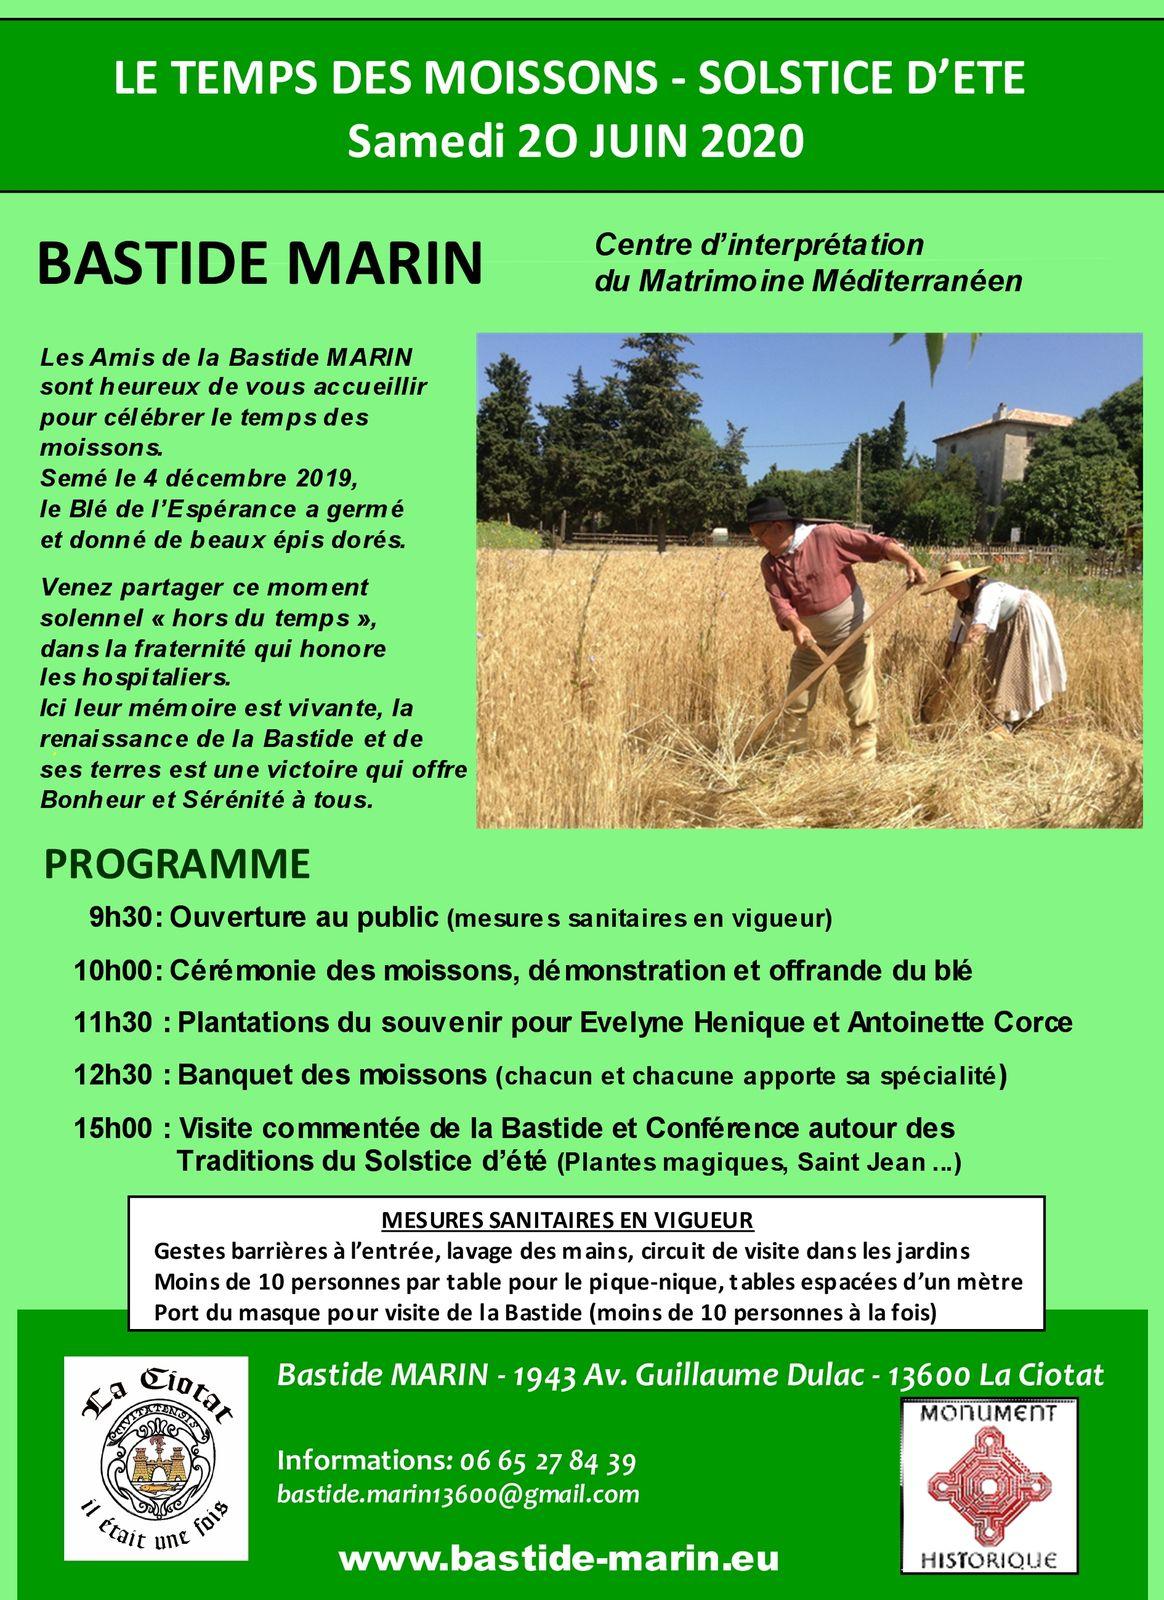 Samedi 20 juin à la Bastide MARIN - Le temps des moissons